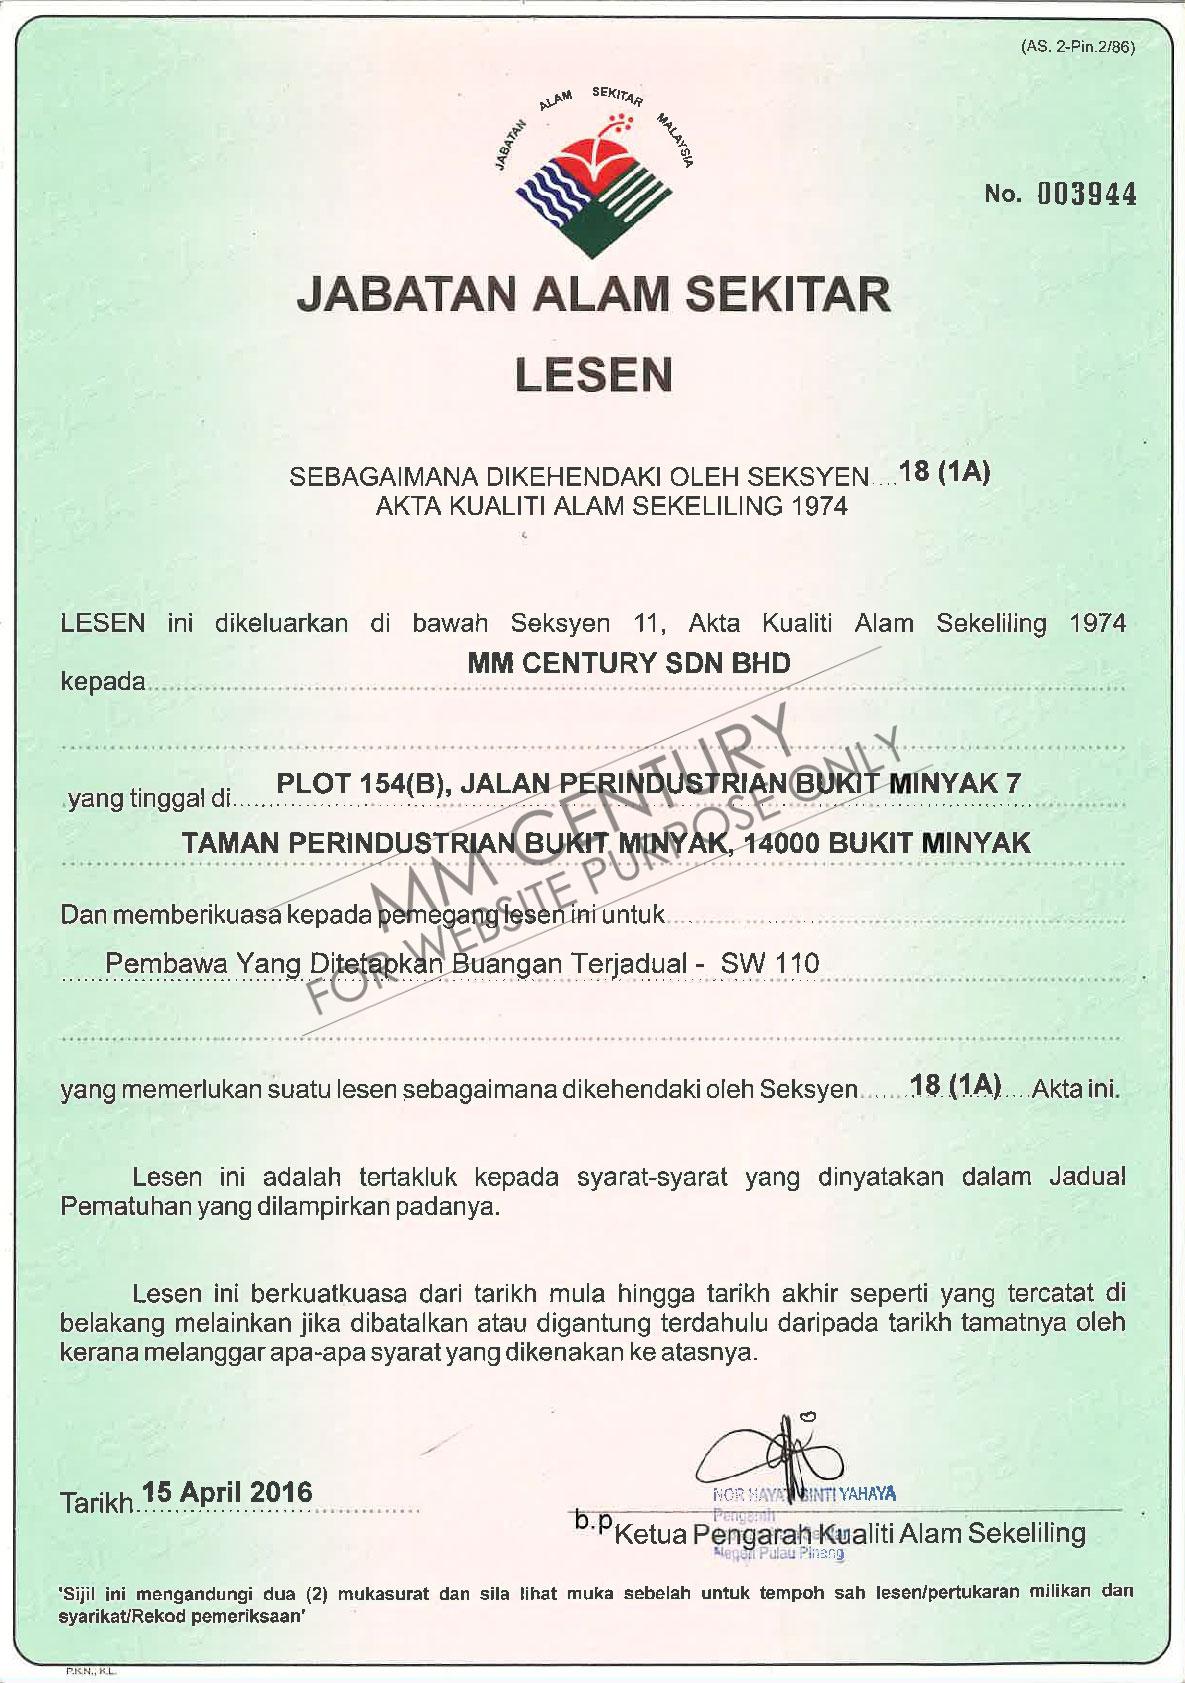 MM Century- Certification, Jabatan Alam Sekitar Lesen